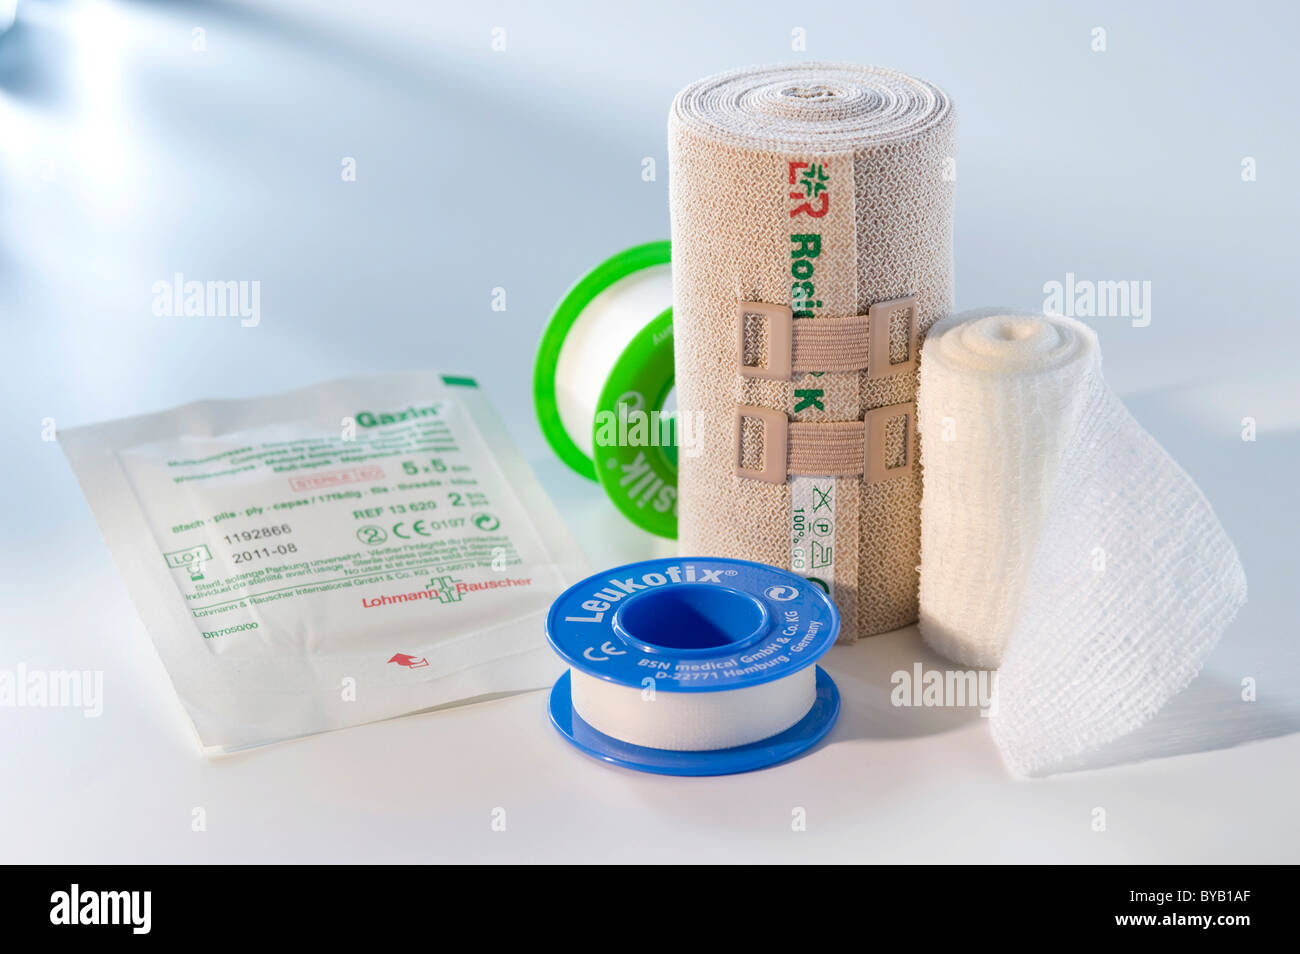 Pansements, ruban adhésif médical, plâtre Photo Stock